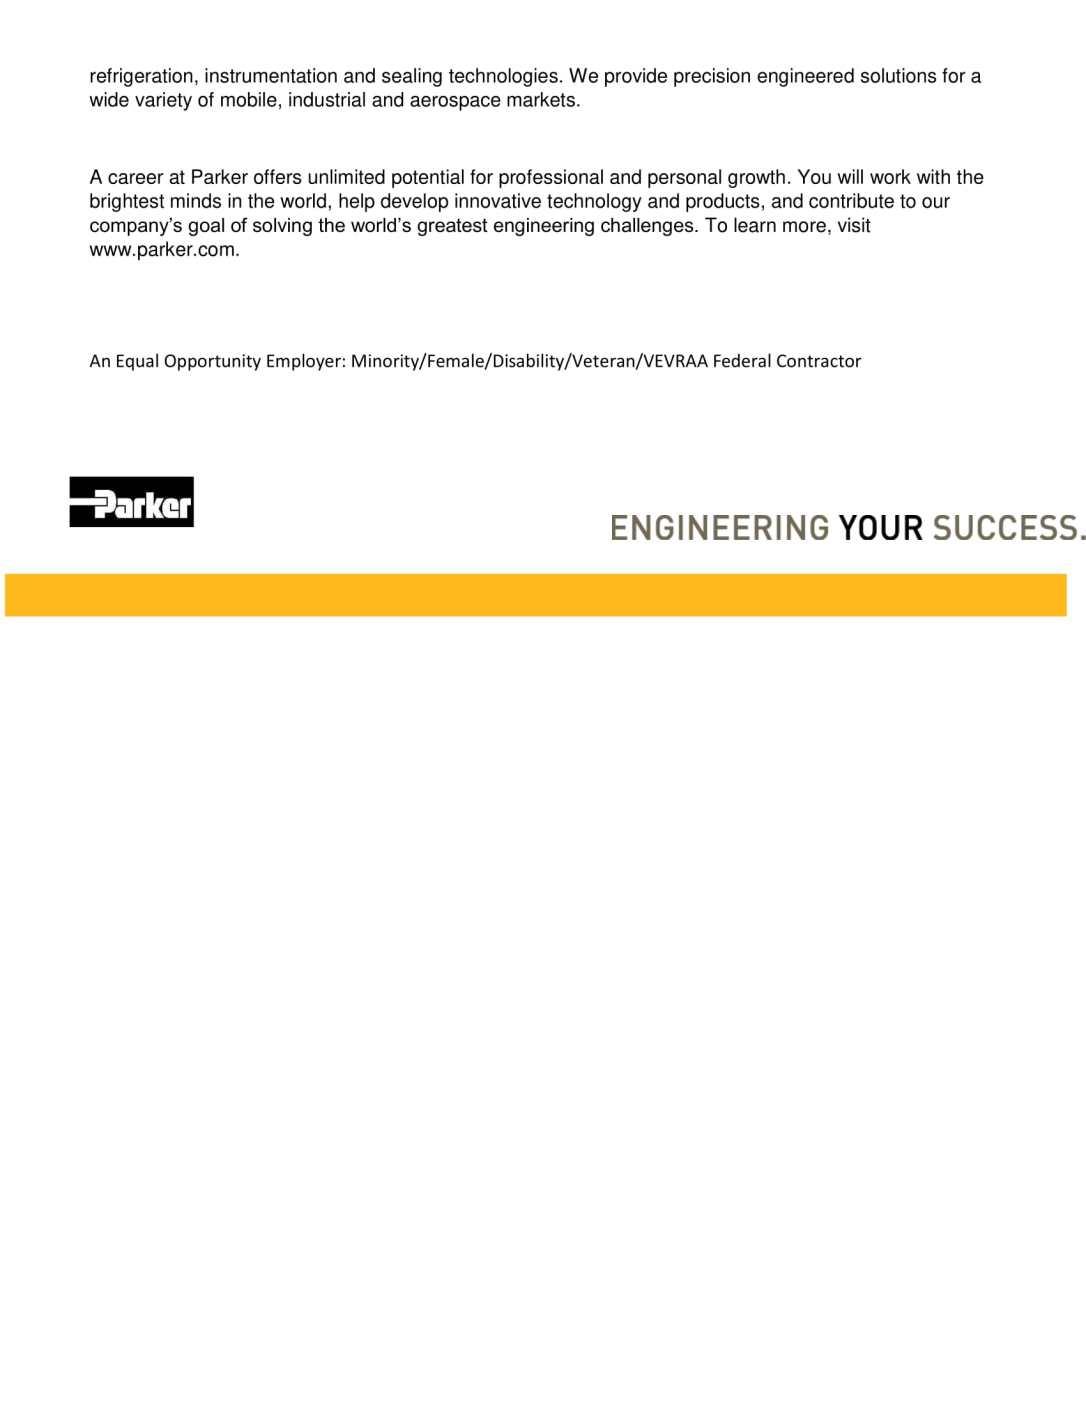 Purdue Industrial Roundtable Seminar flyer 2018-2